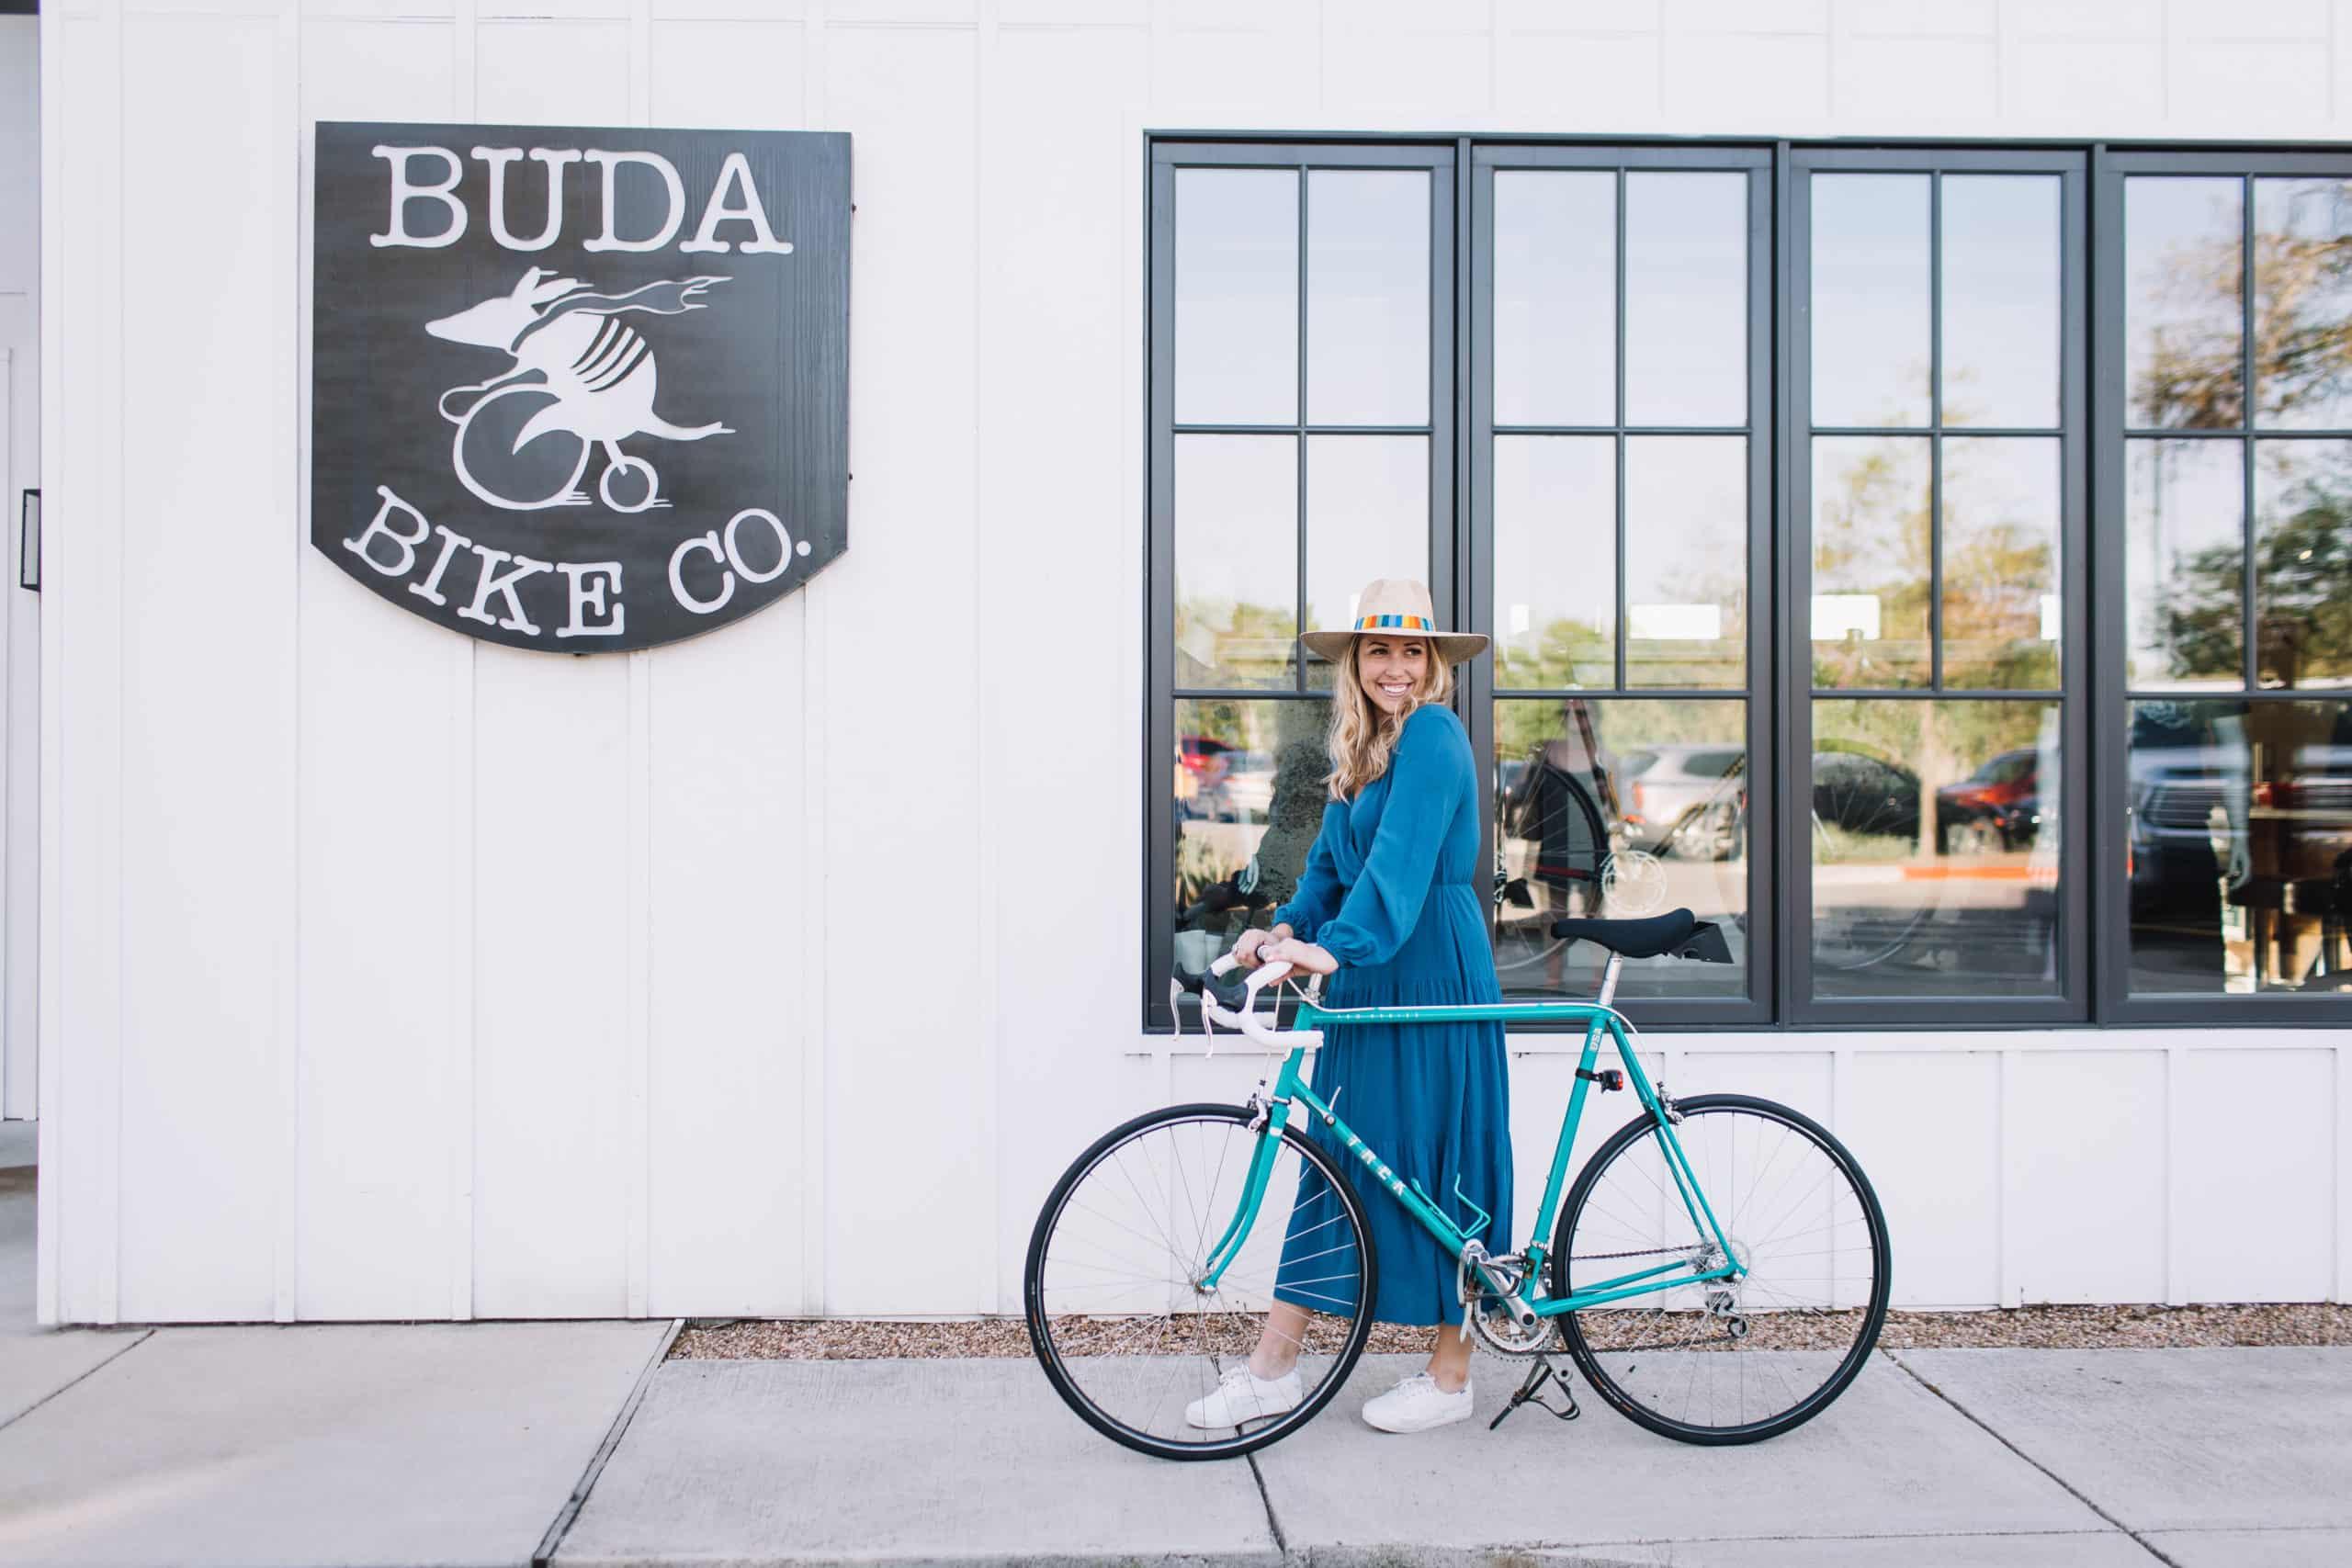 Buda Bike Company | Buda, Texas